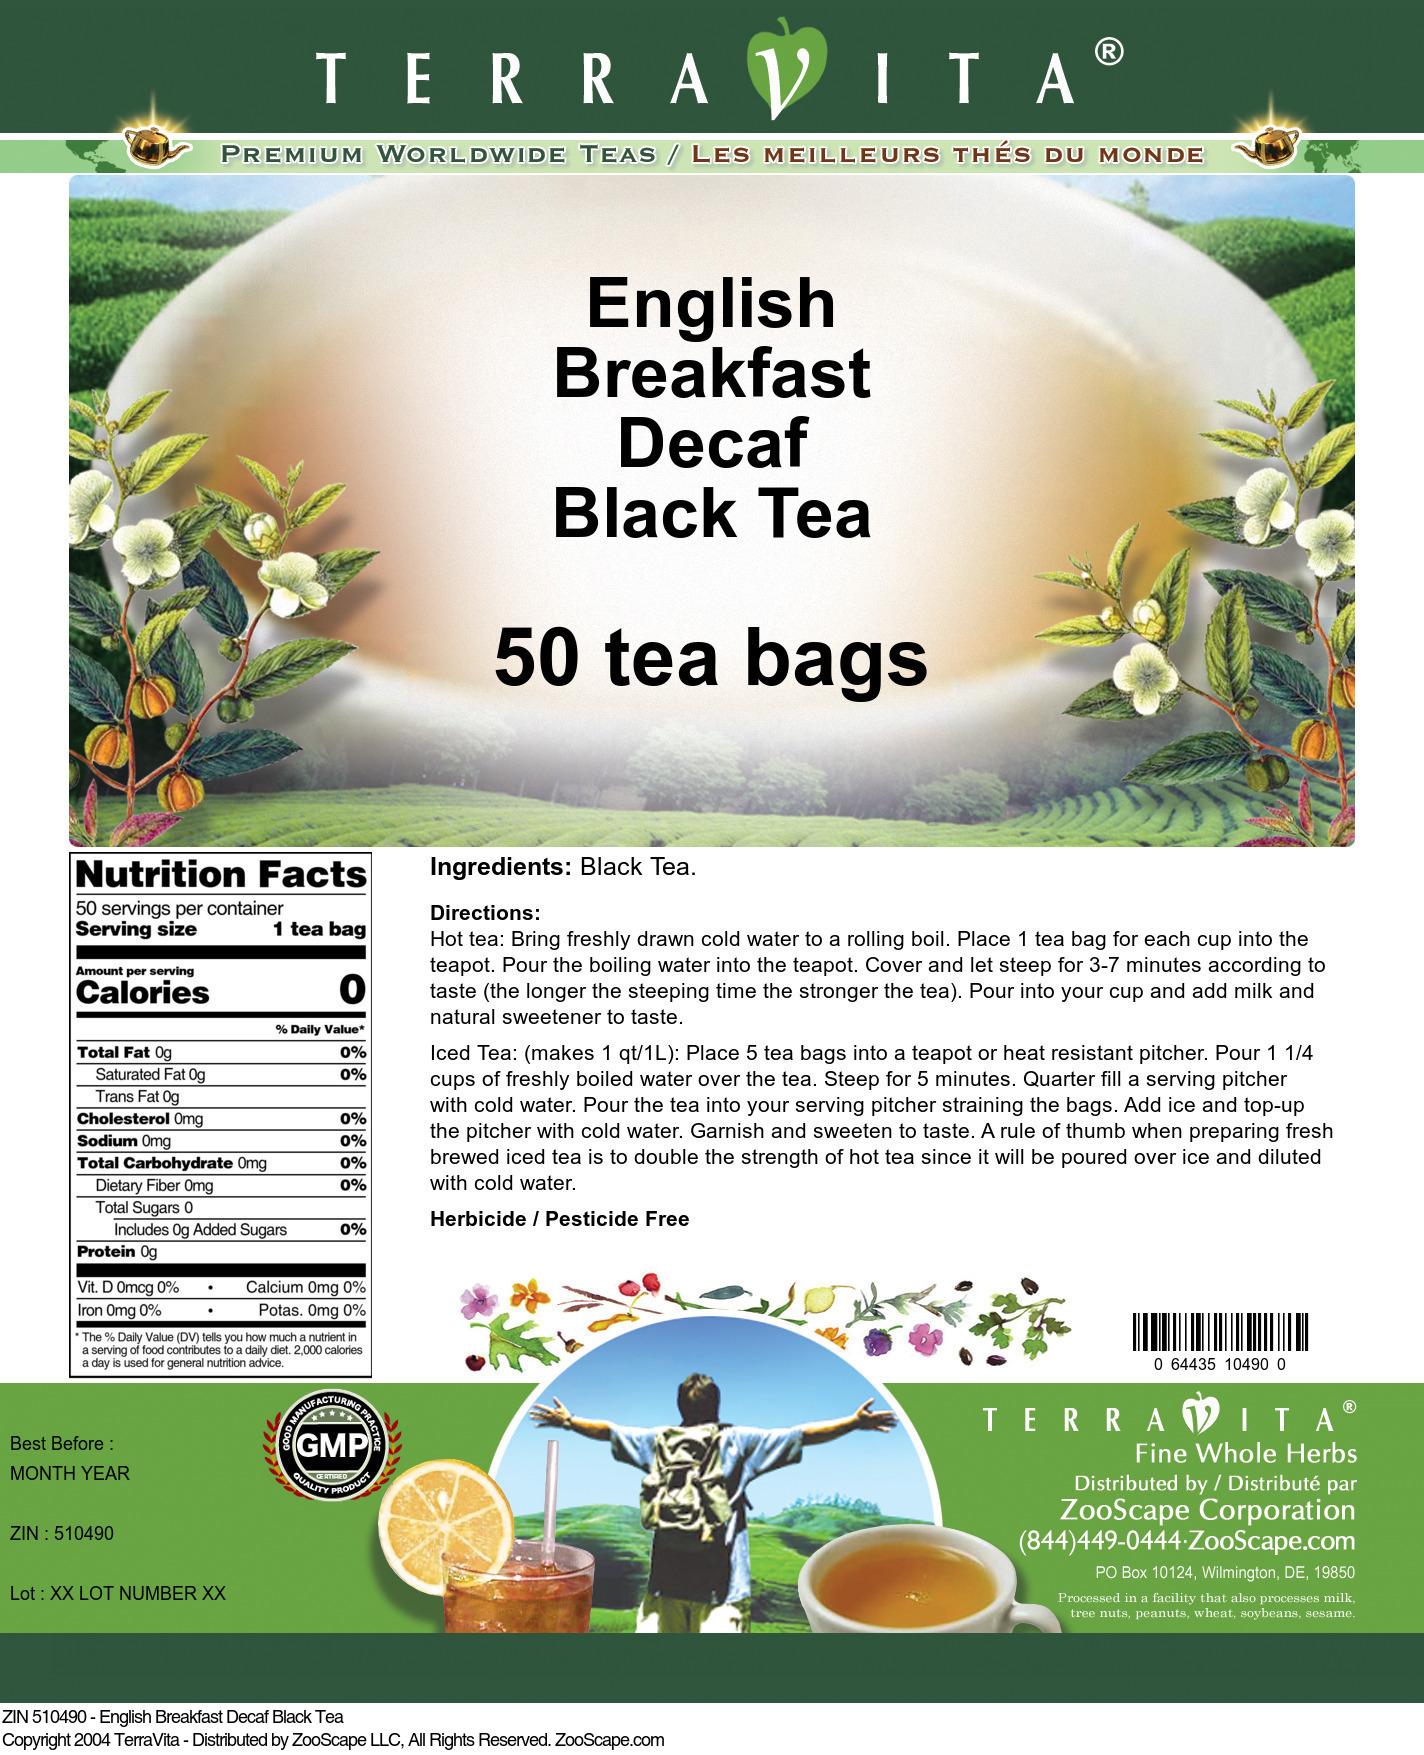 English Breakfast Decaf Black Tea